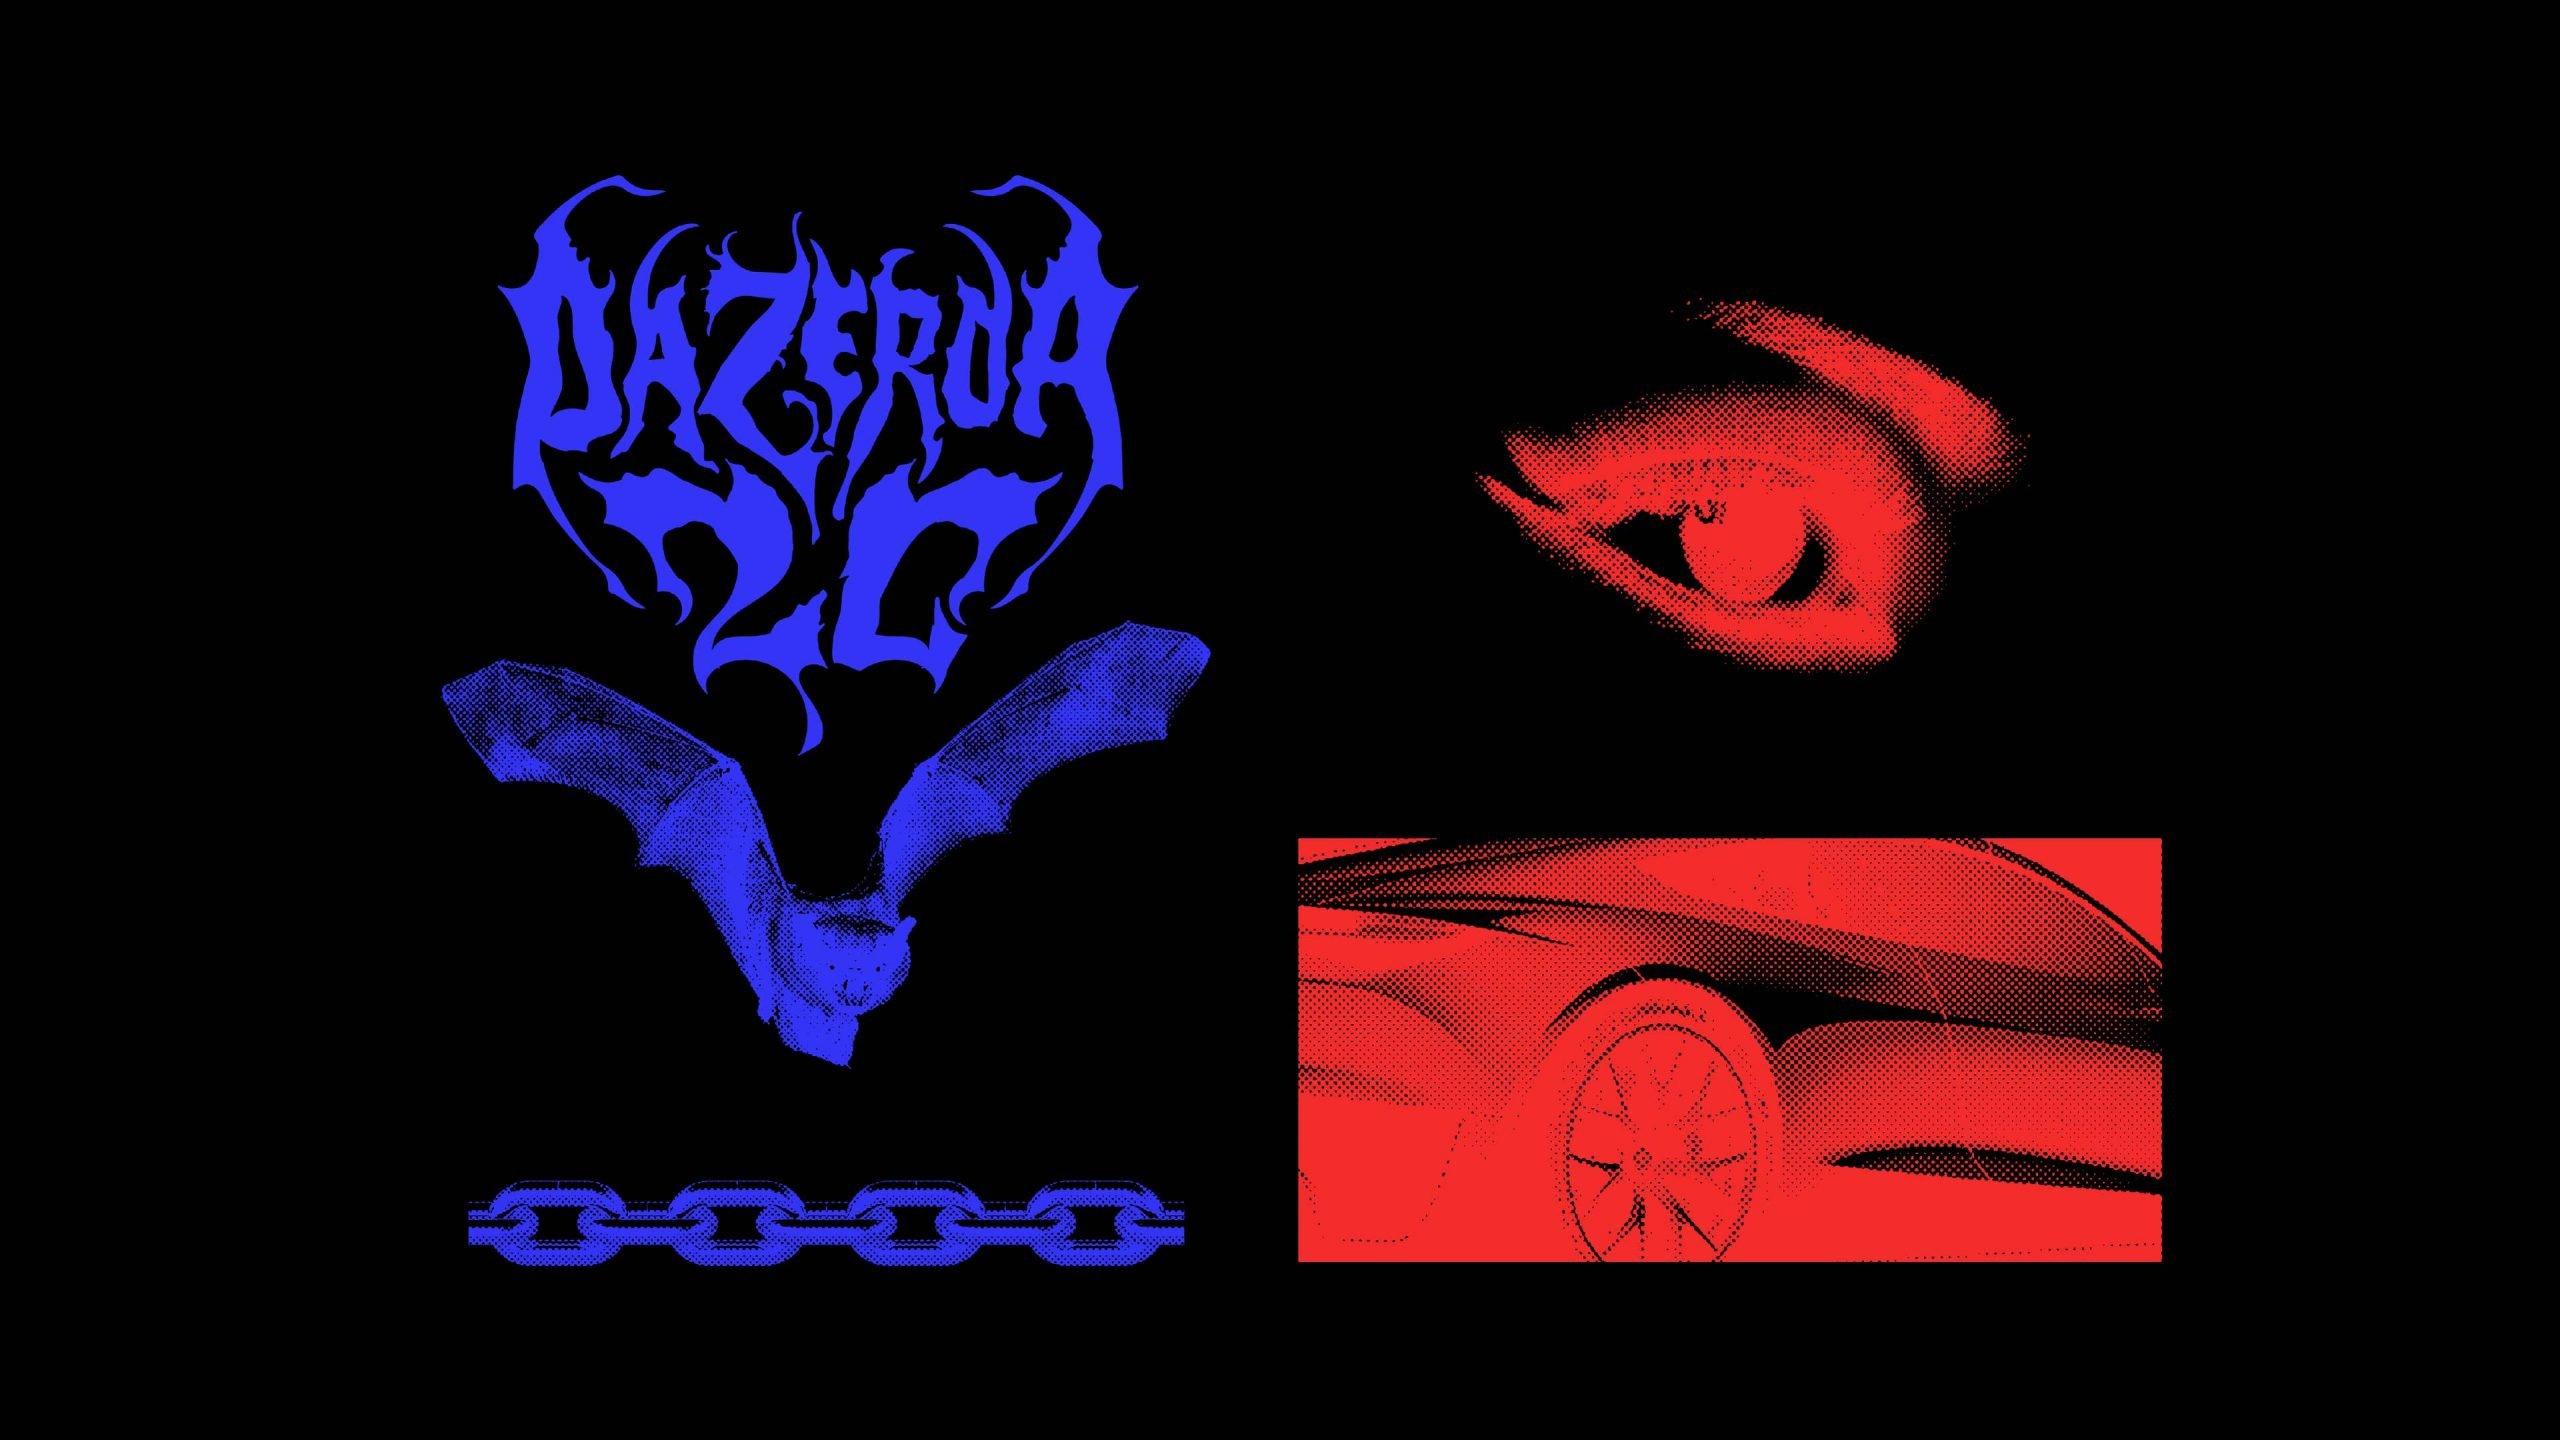 CAPO-PLAZA-TOUR-MERCH-Graphics-03